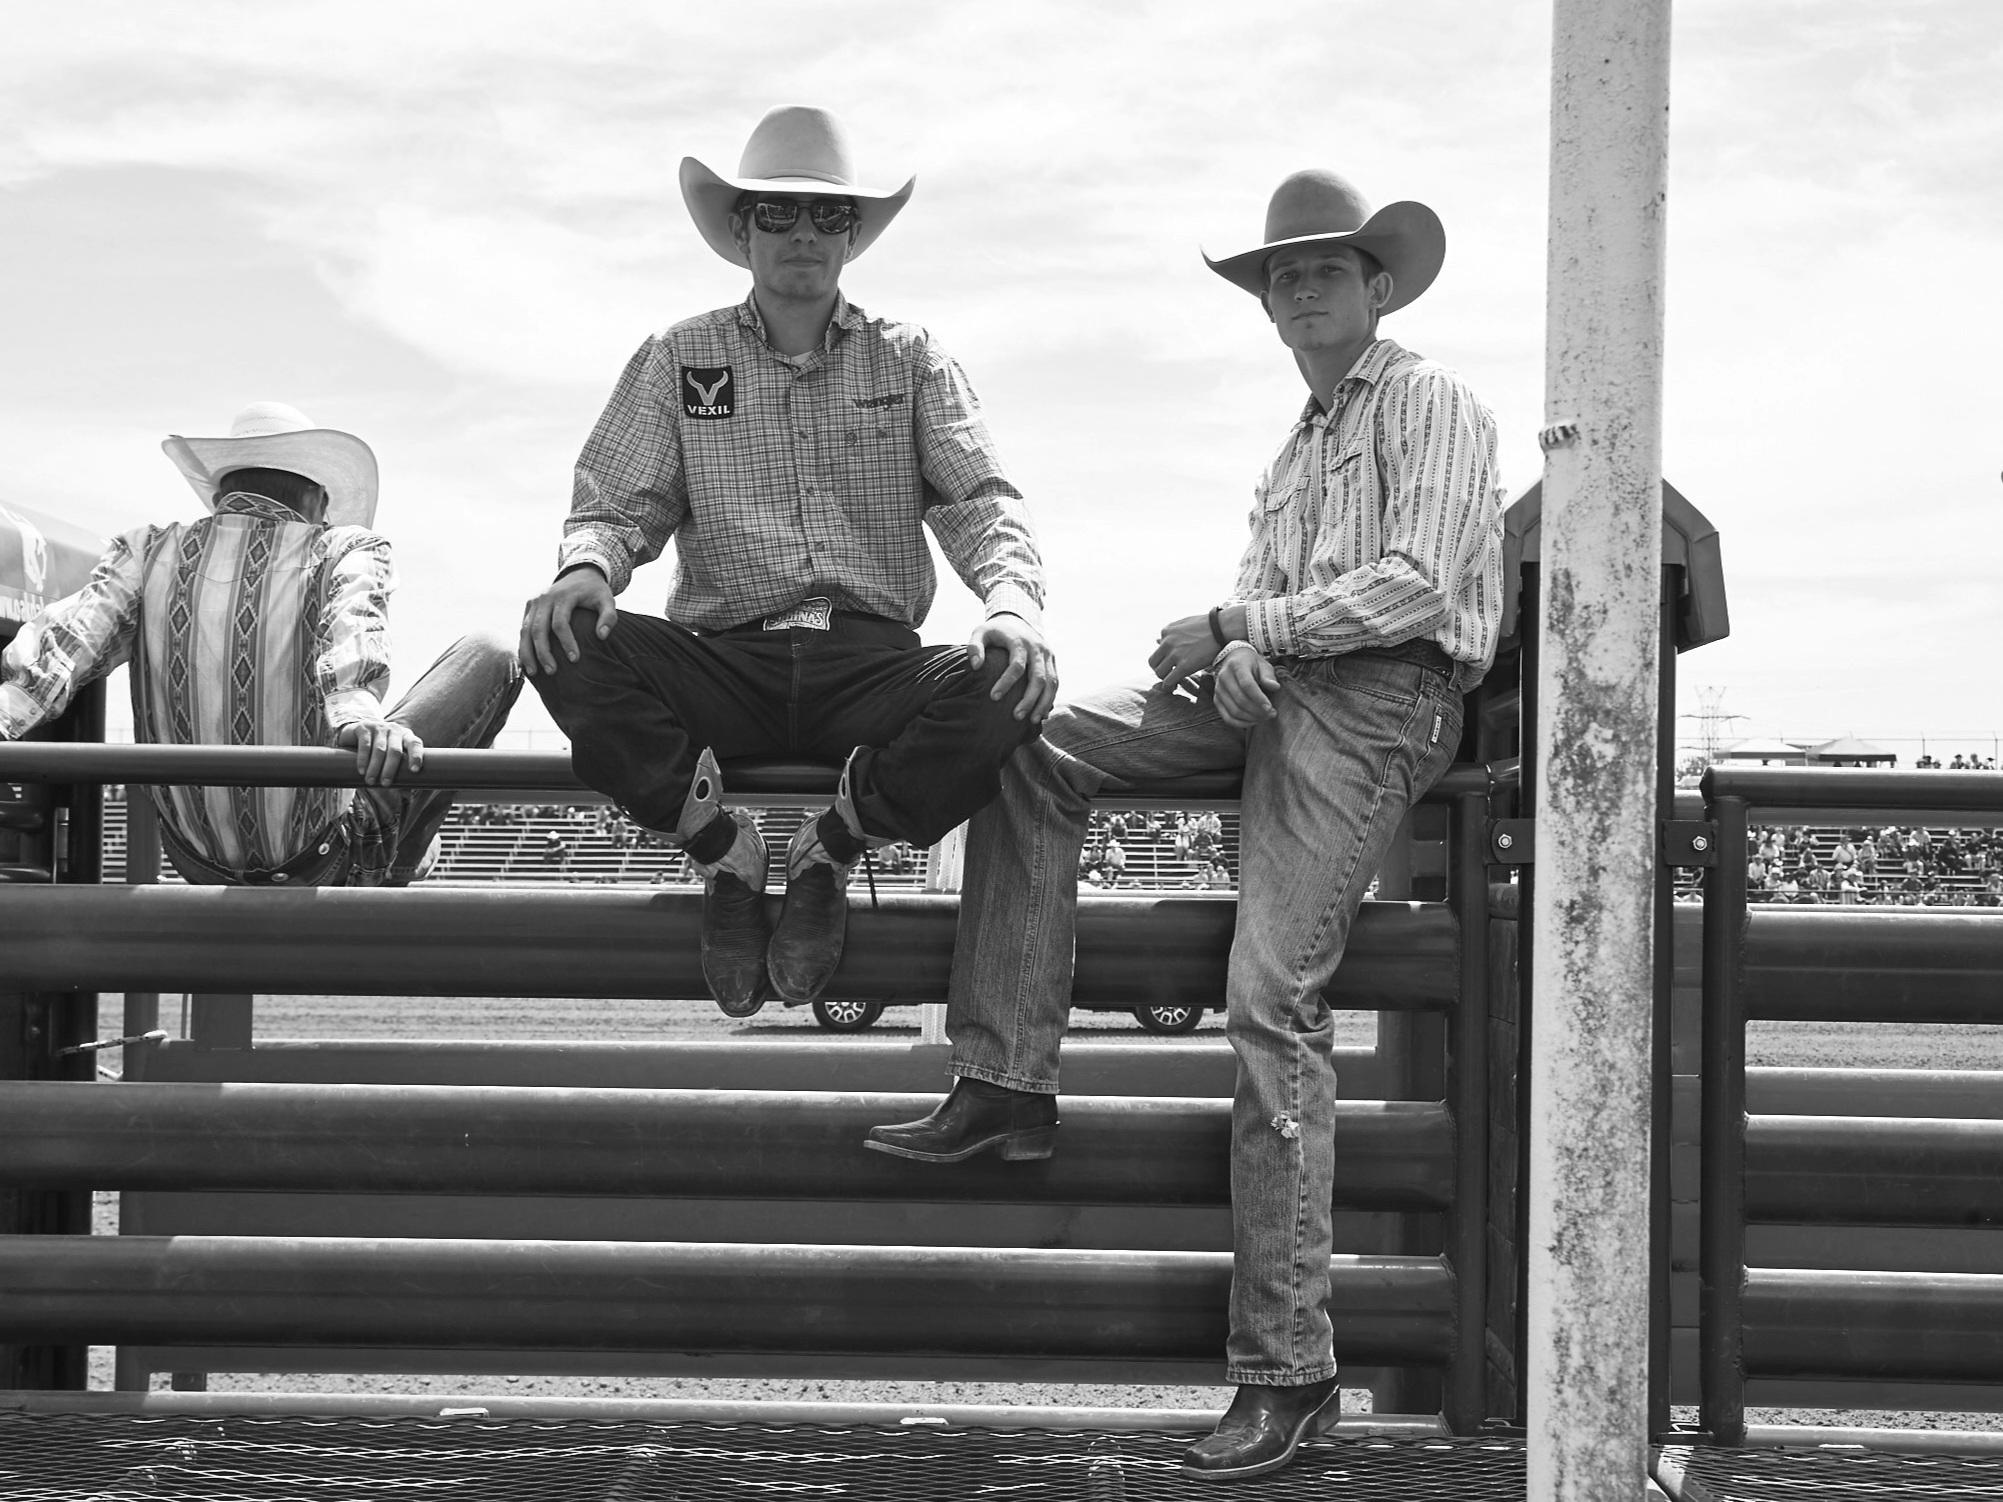 Rodeo_2019_049.jpg